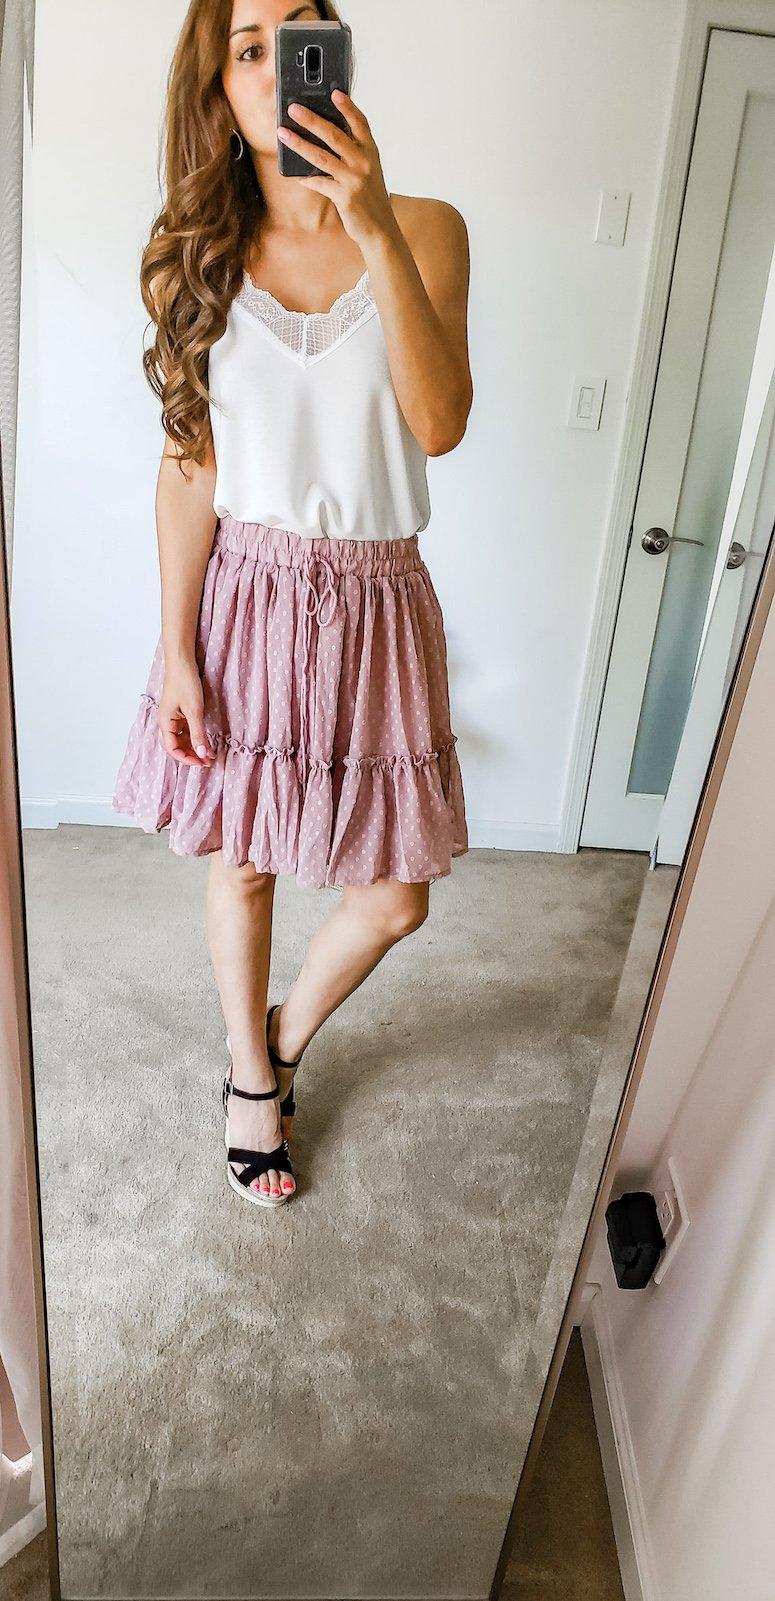 pink ruffle skirt and white cami